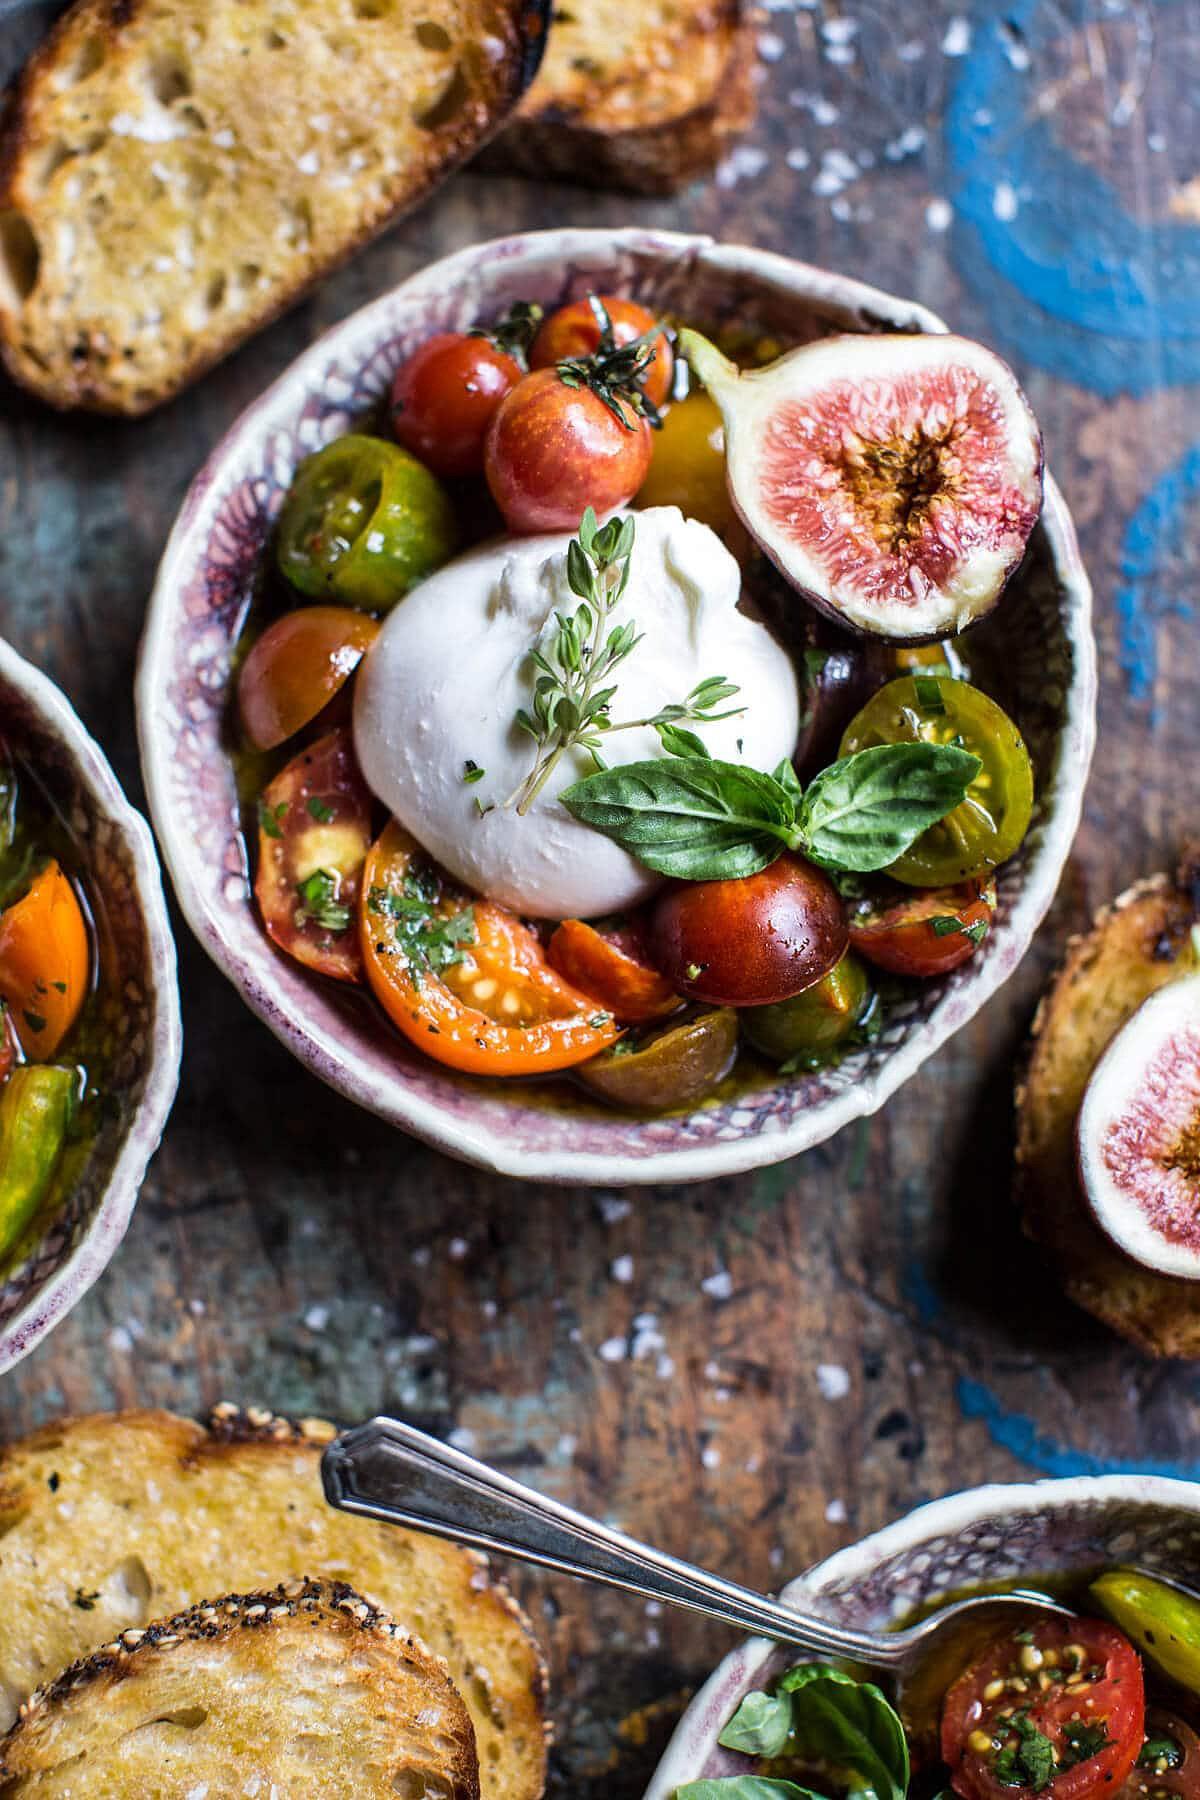 Marinated-Cherry-Tomatoes-with-Burrata-Toast-1.jpg